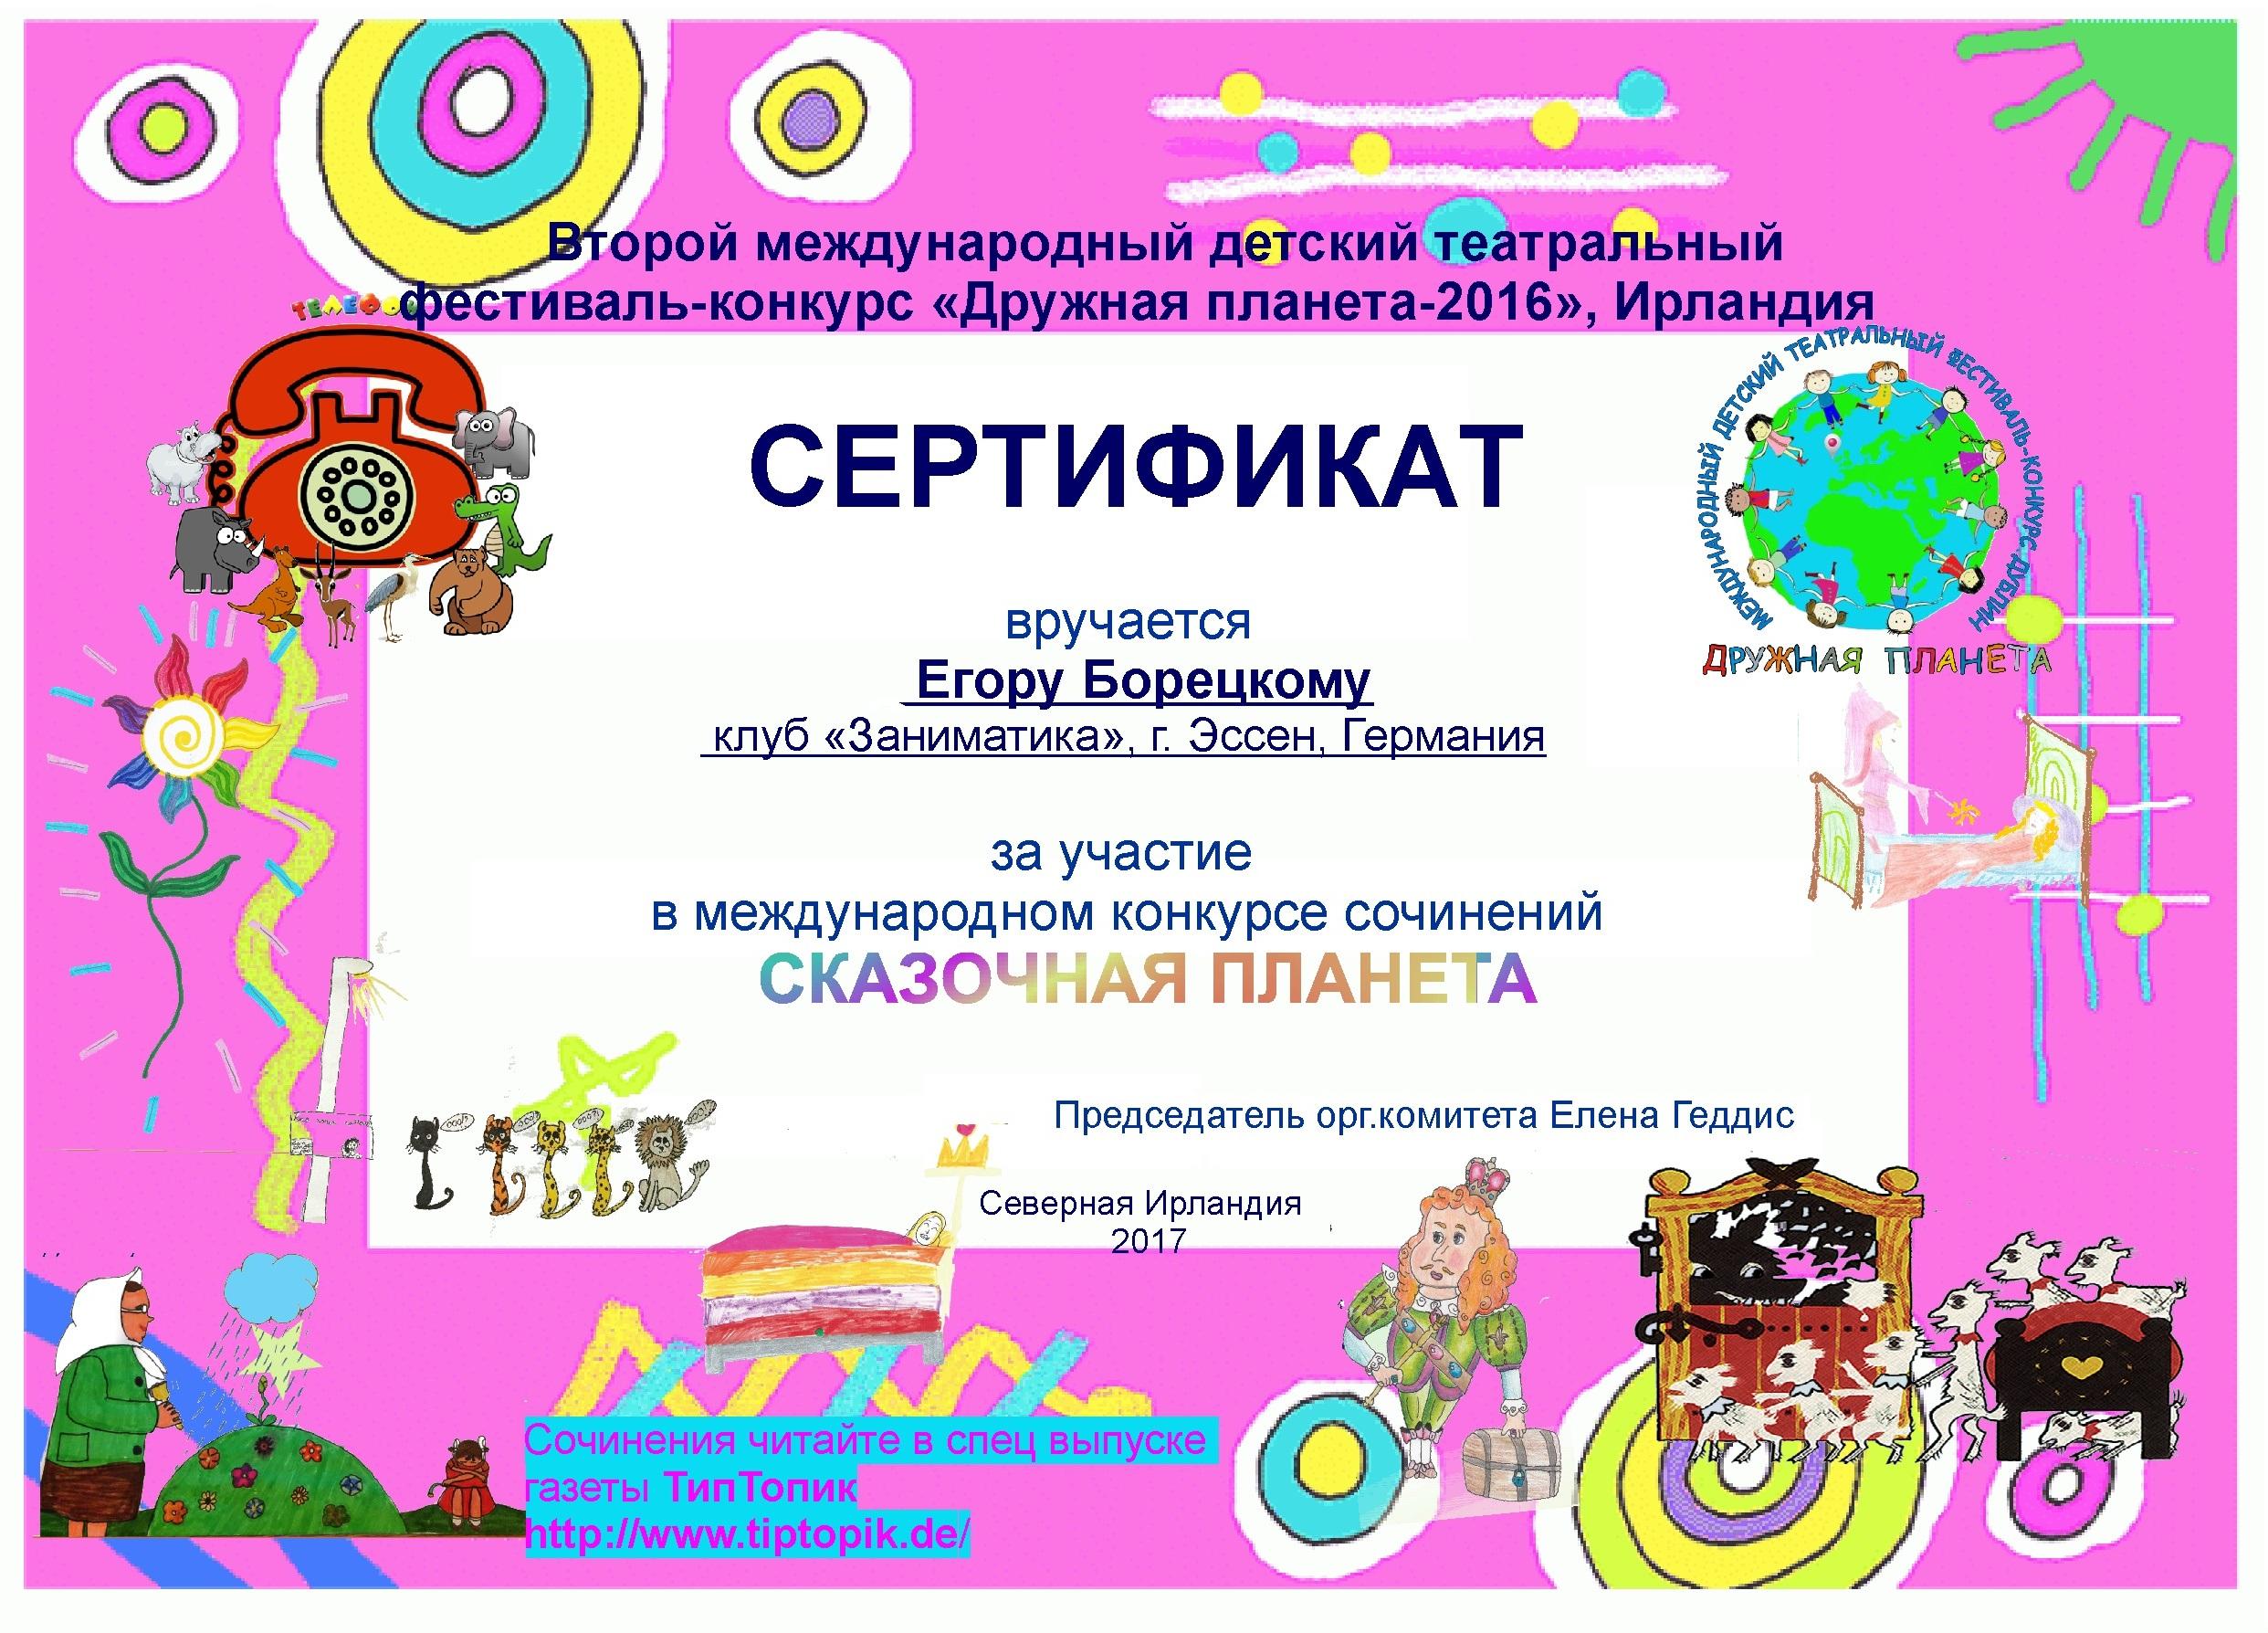 Заниматика Егор.jpg